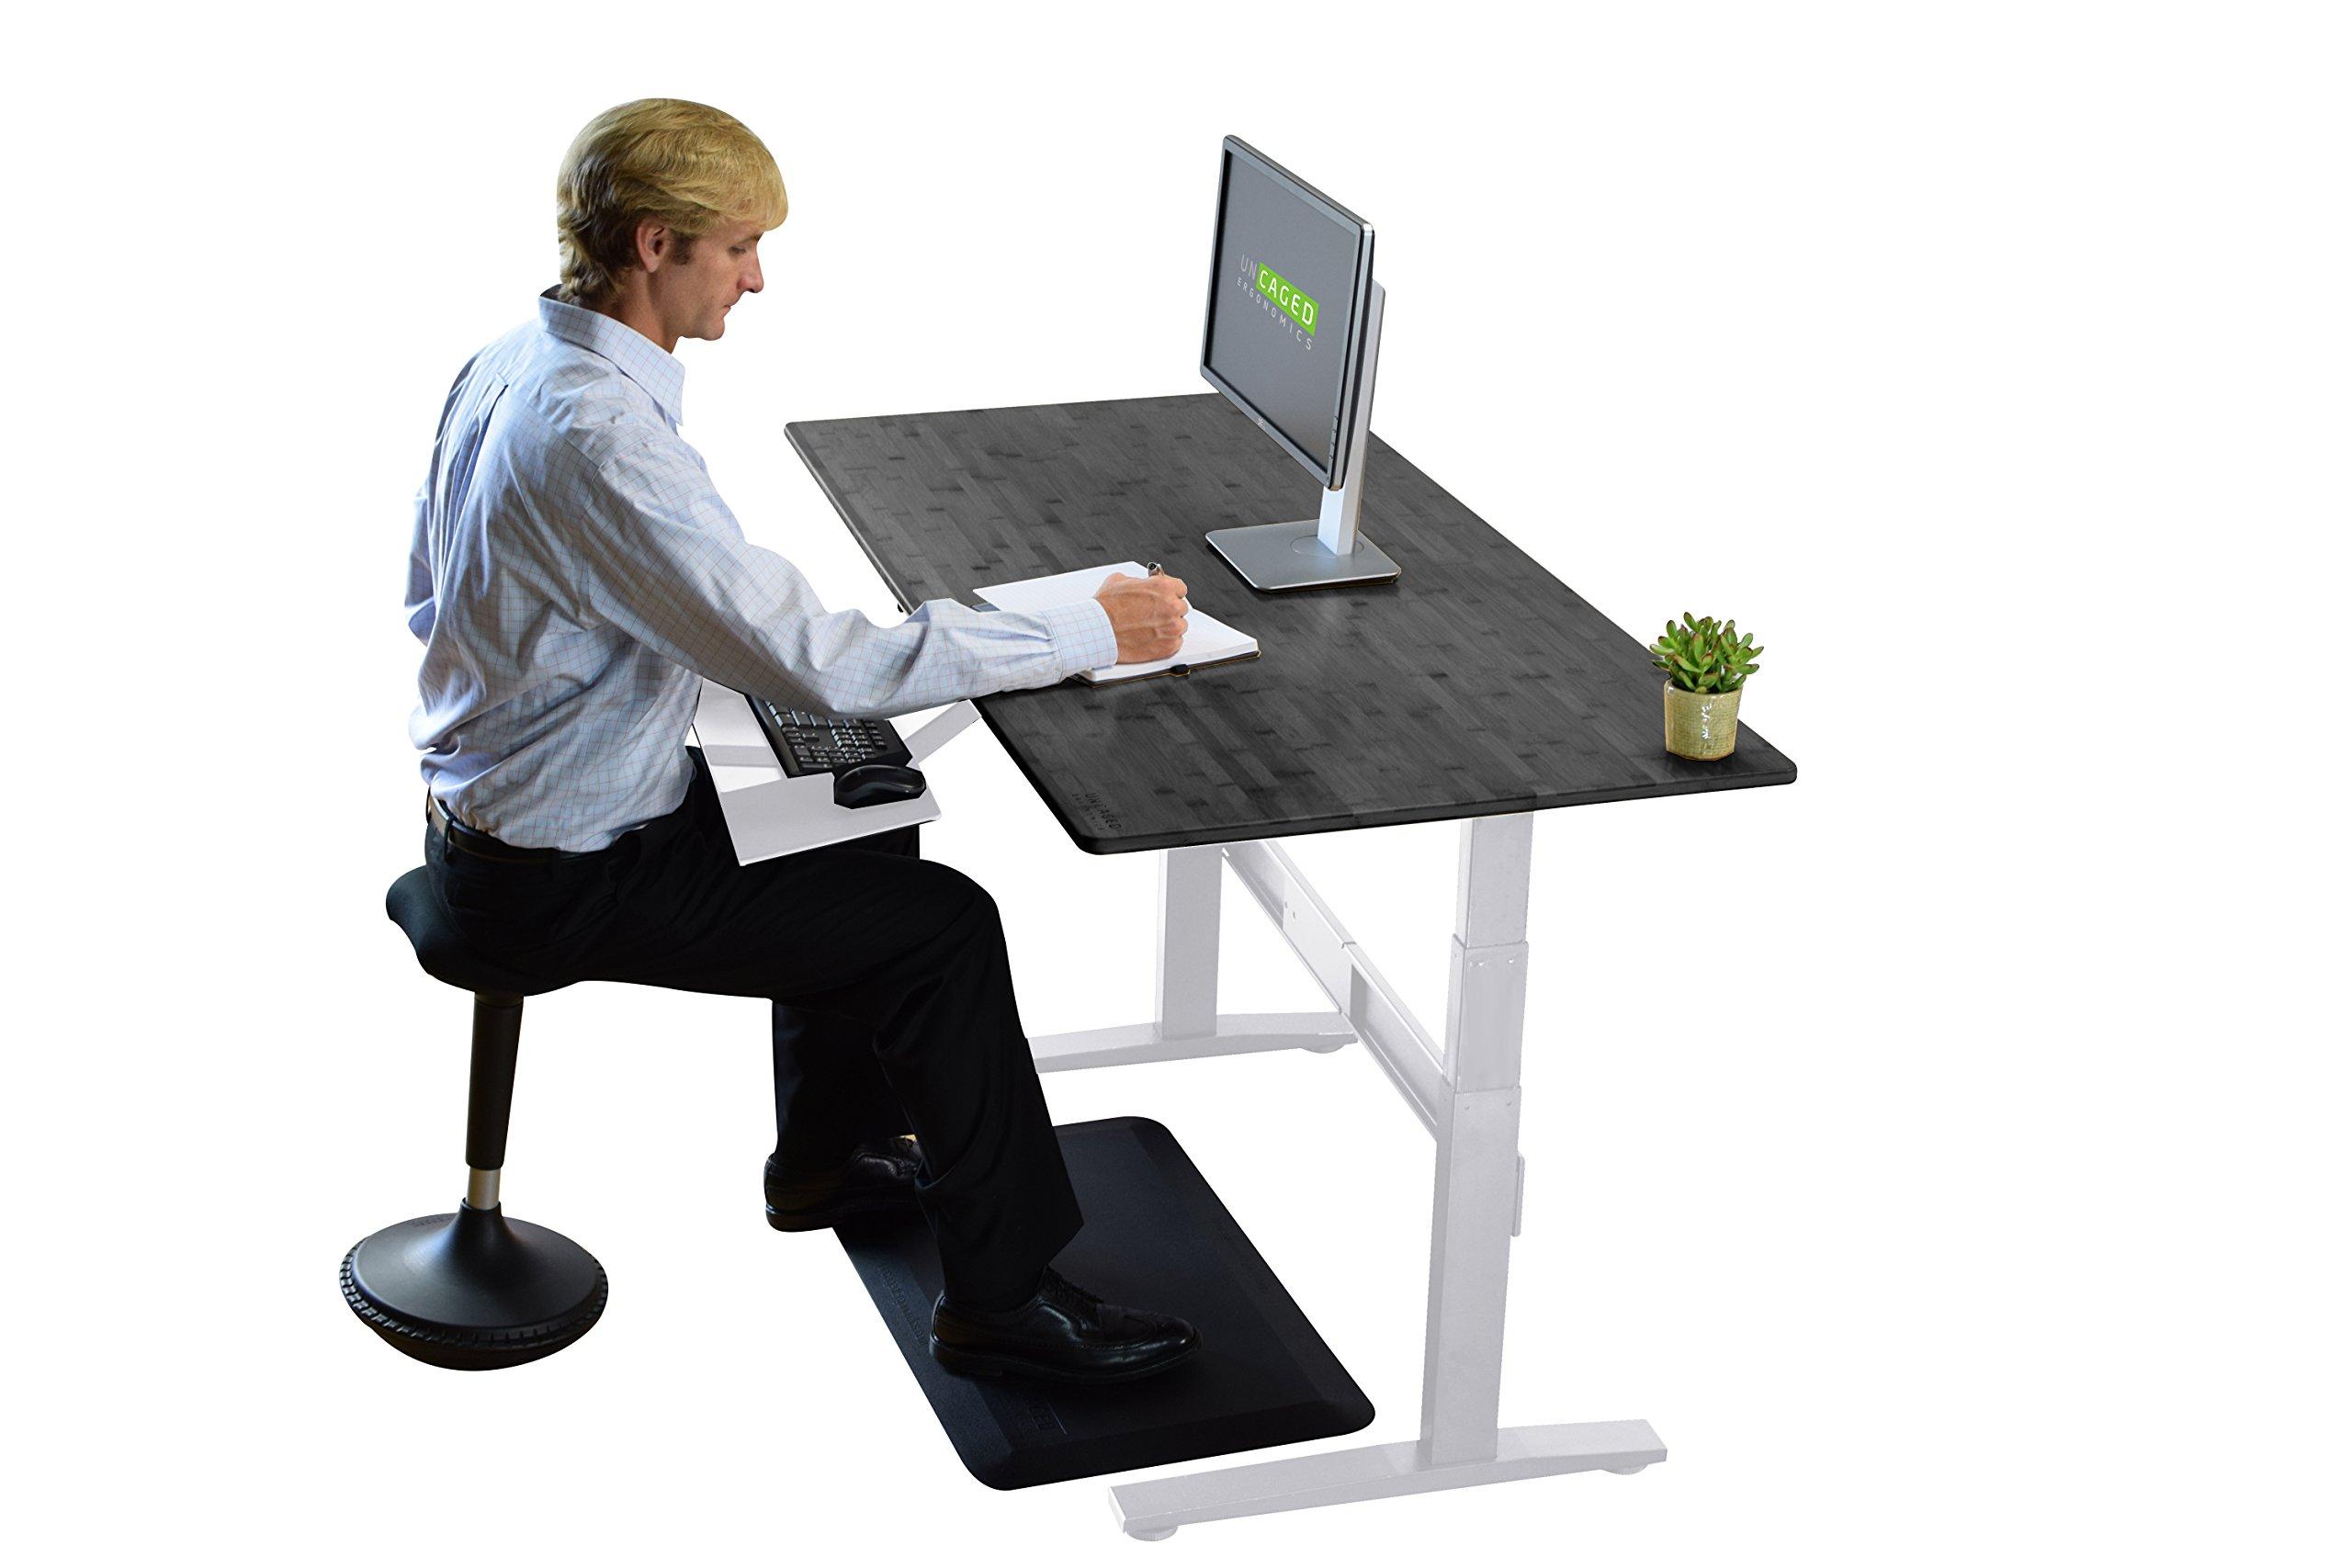 RISE UP Electric Adjustable Height Standing Desk + Beautiful Black Bamboo Desktop| Memory Keypad| 2 Motors| Affordable Ergonomic Sit Stand Office Desk by Uncaged Ergonomics (Image #3)